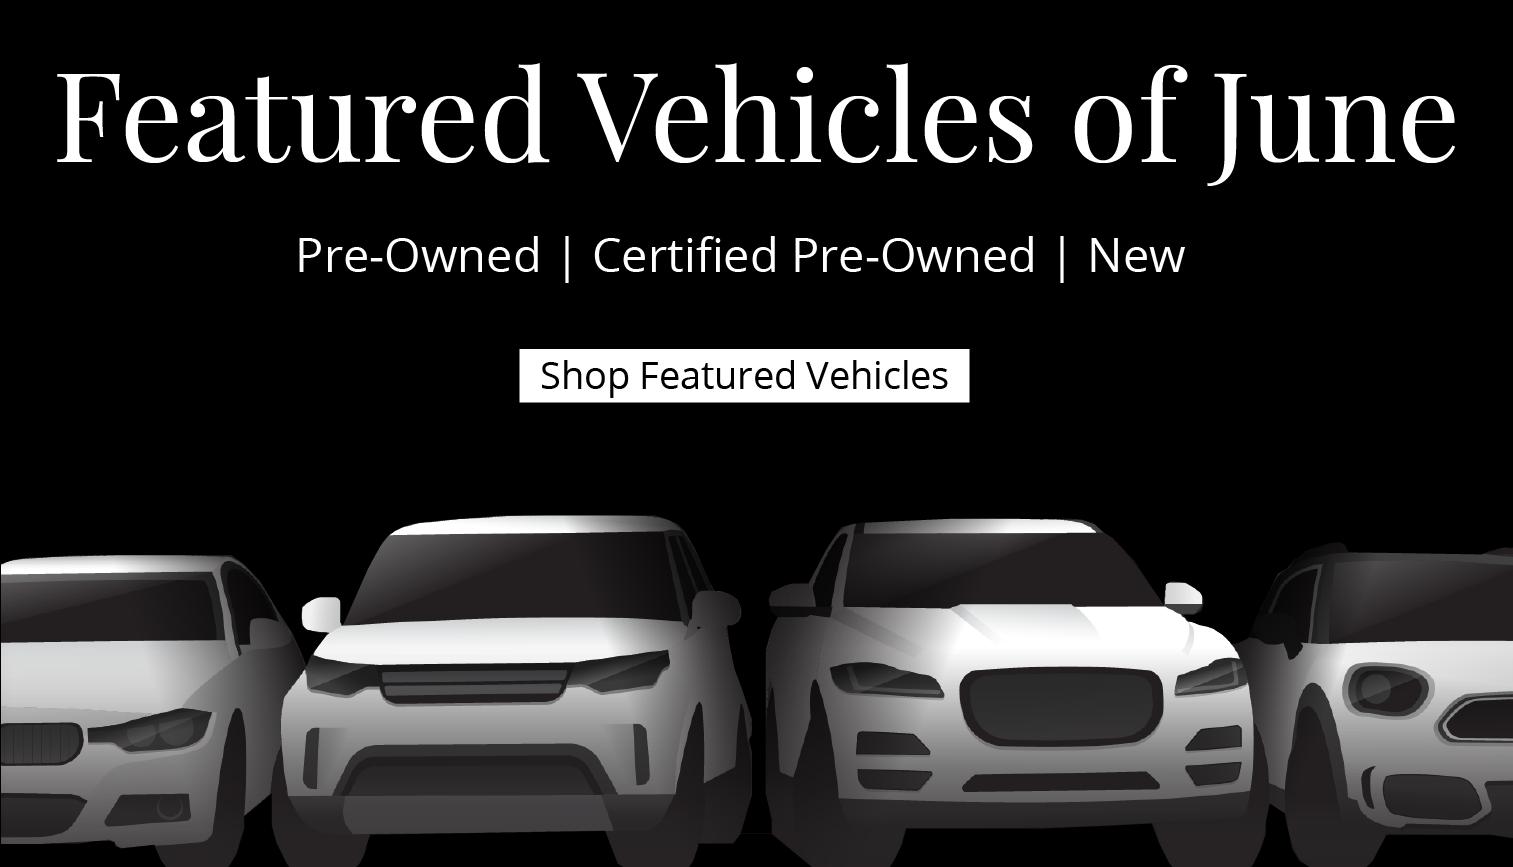 Featured Vehicels of June Homepage Slider-03